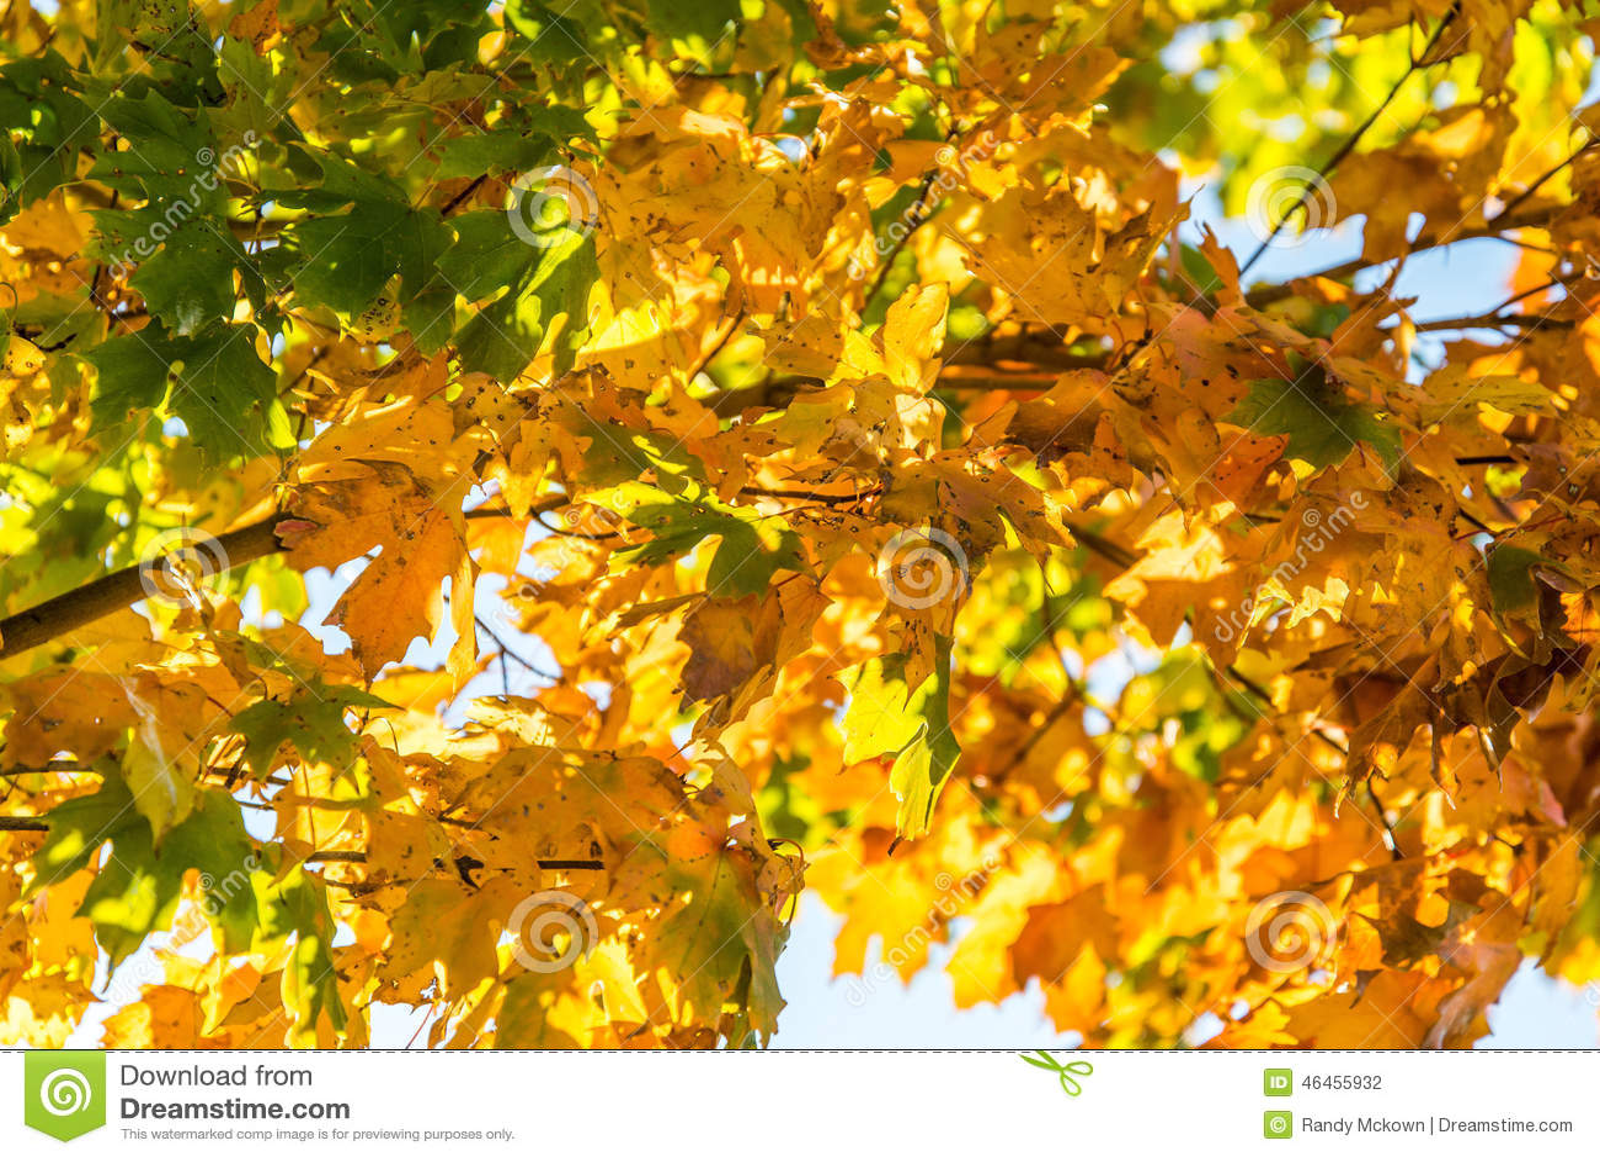 autumn fall tree backgrounds - photo #31